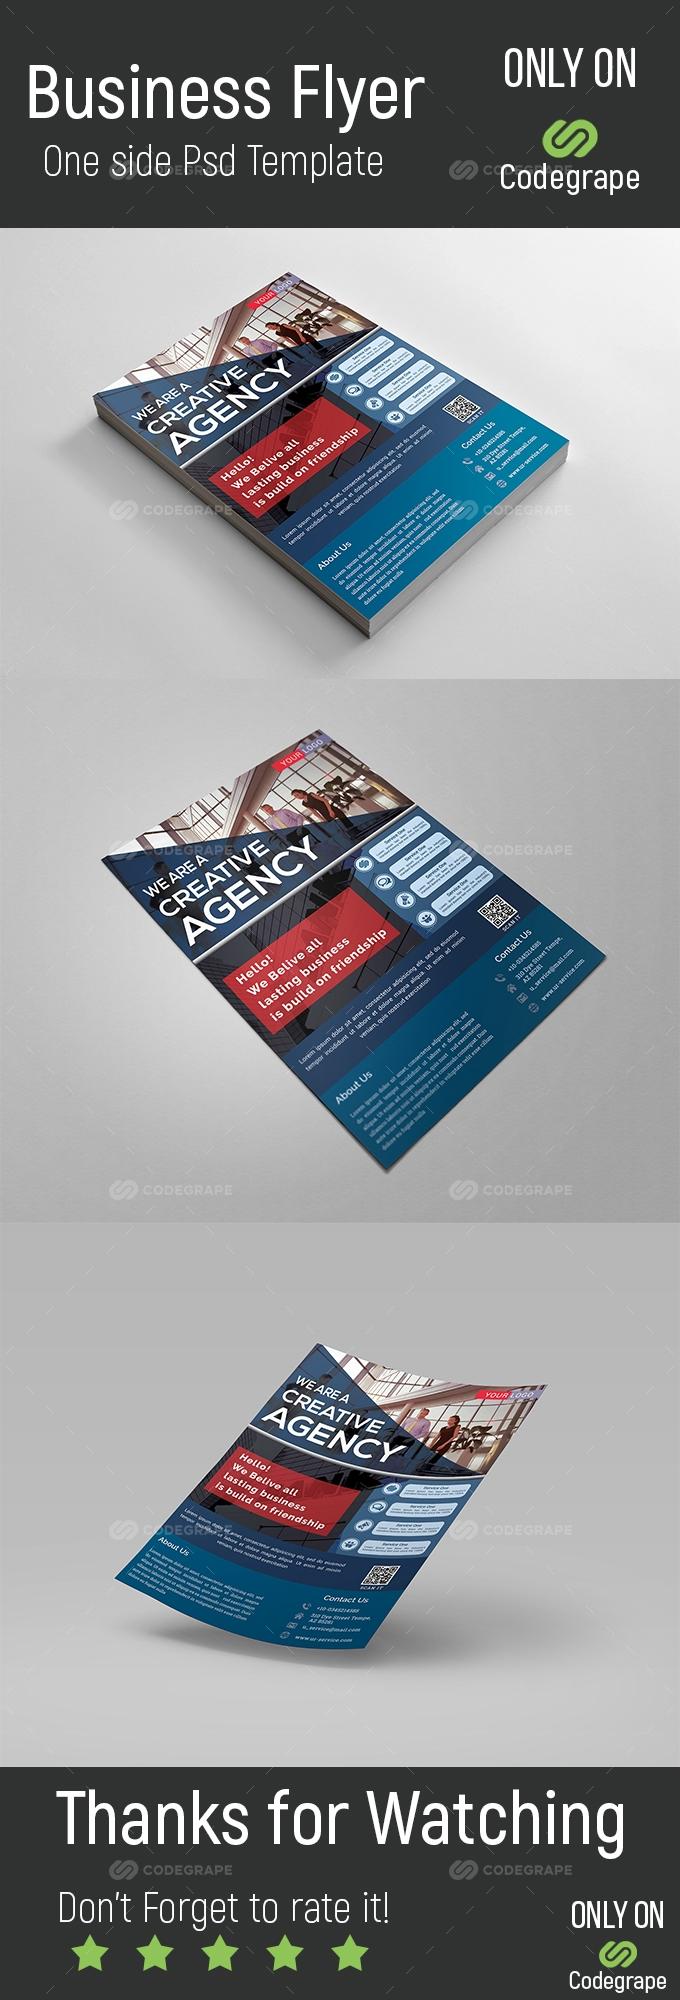 A4 Business Flyer